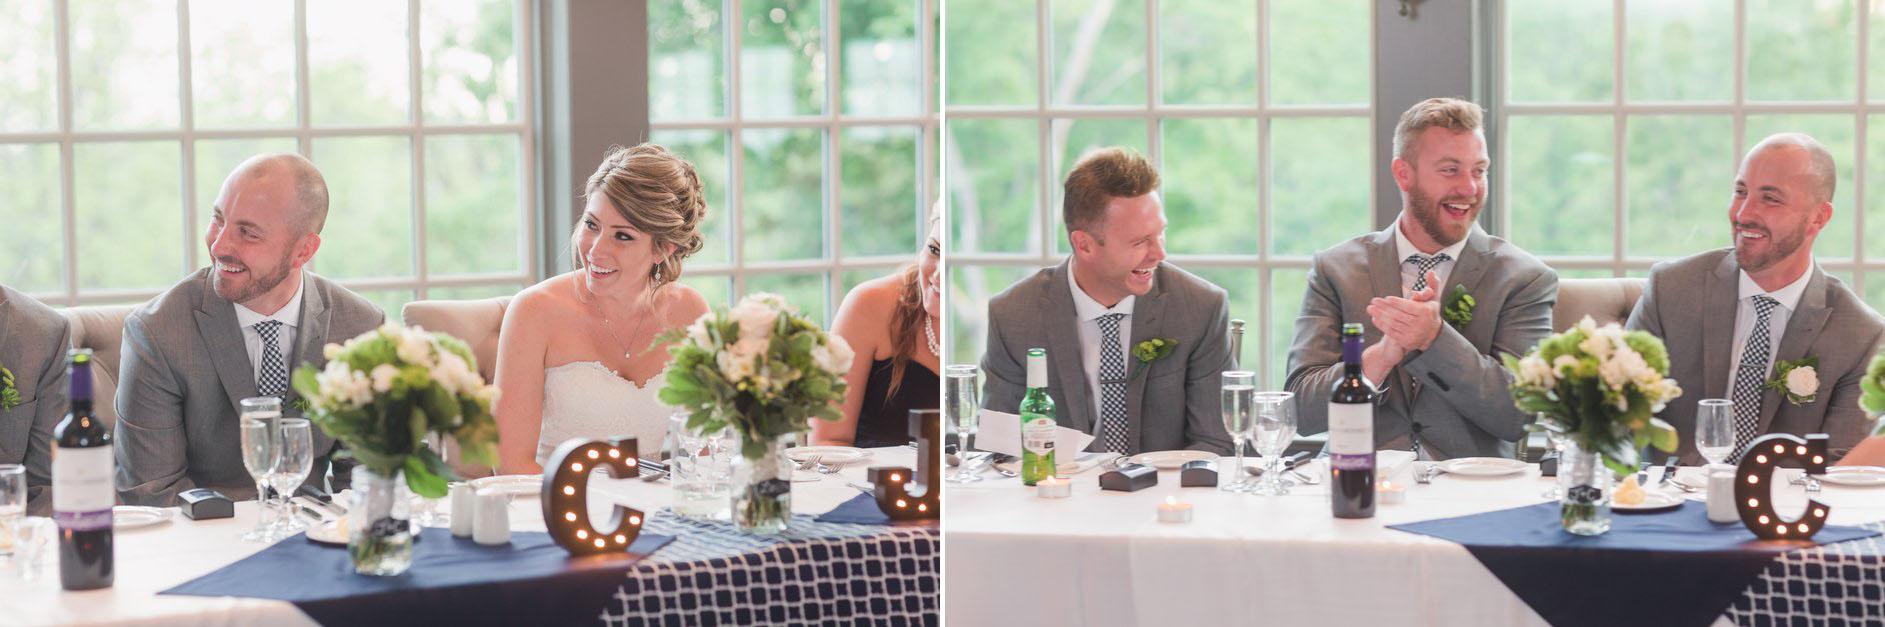 Kleinburg-Doctors-house-wedding-J-C-2016-056